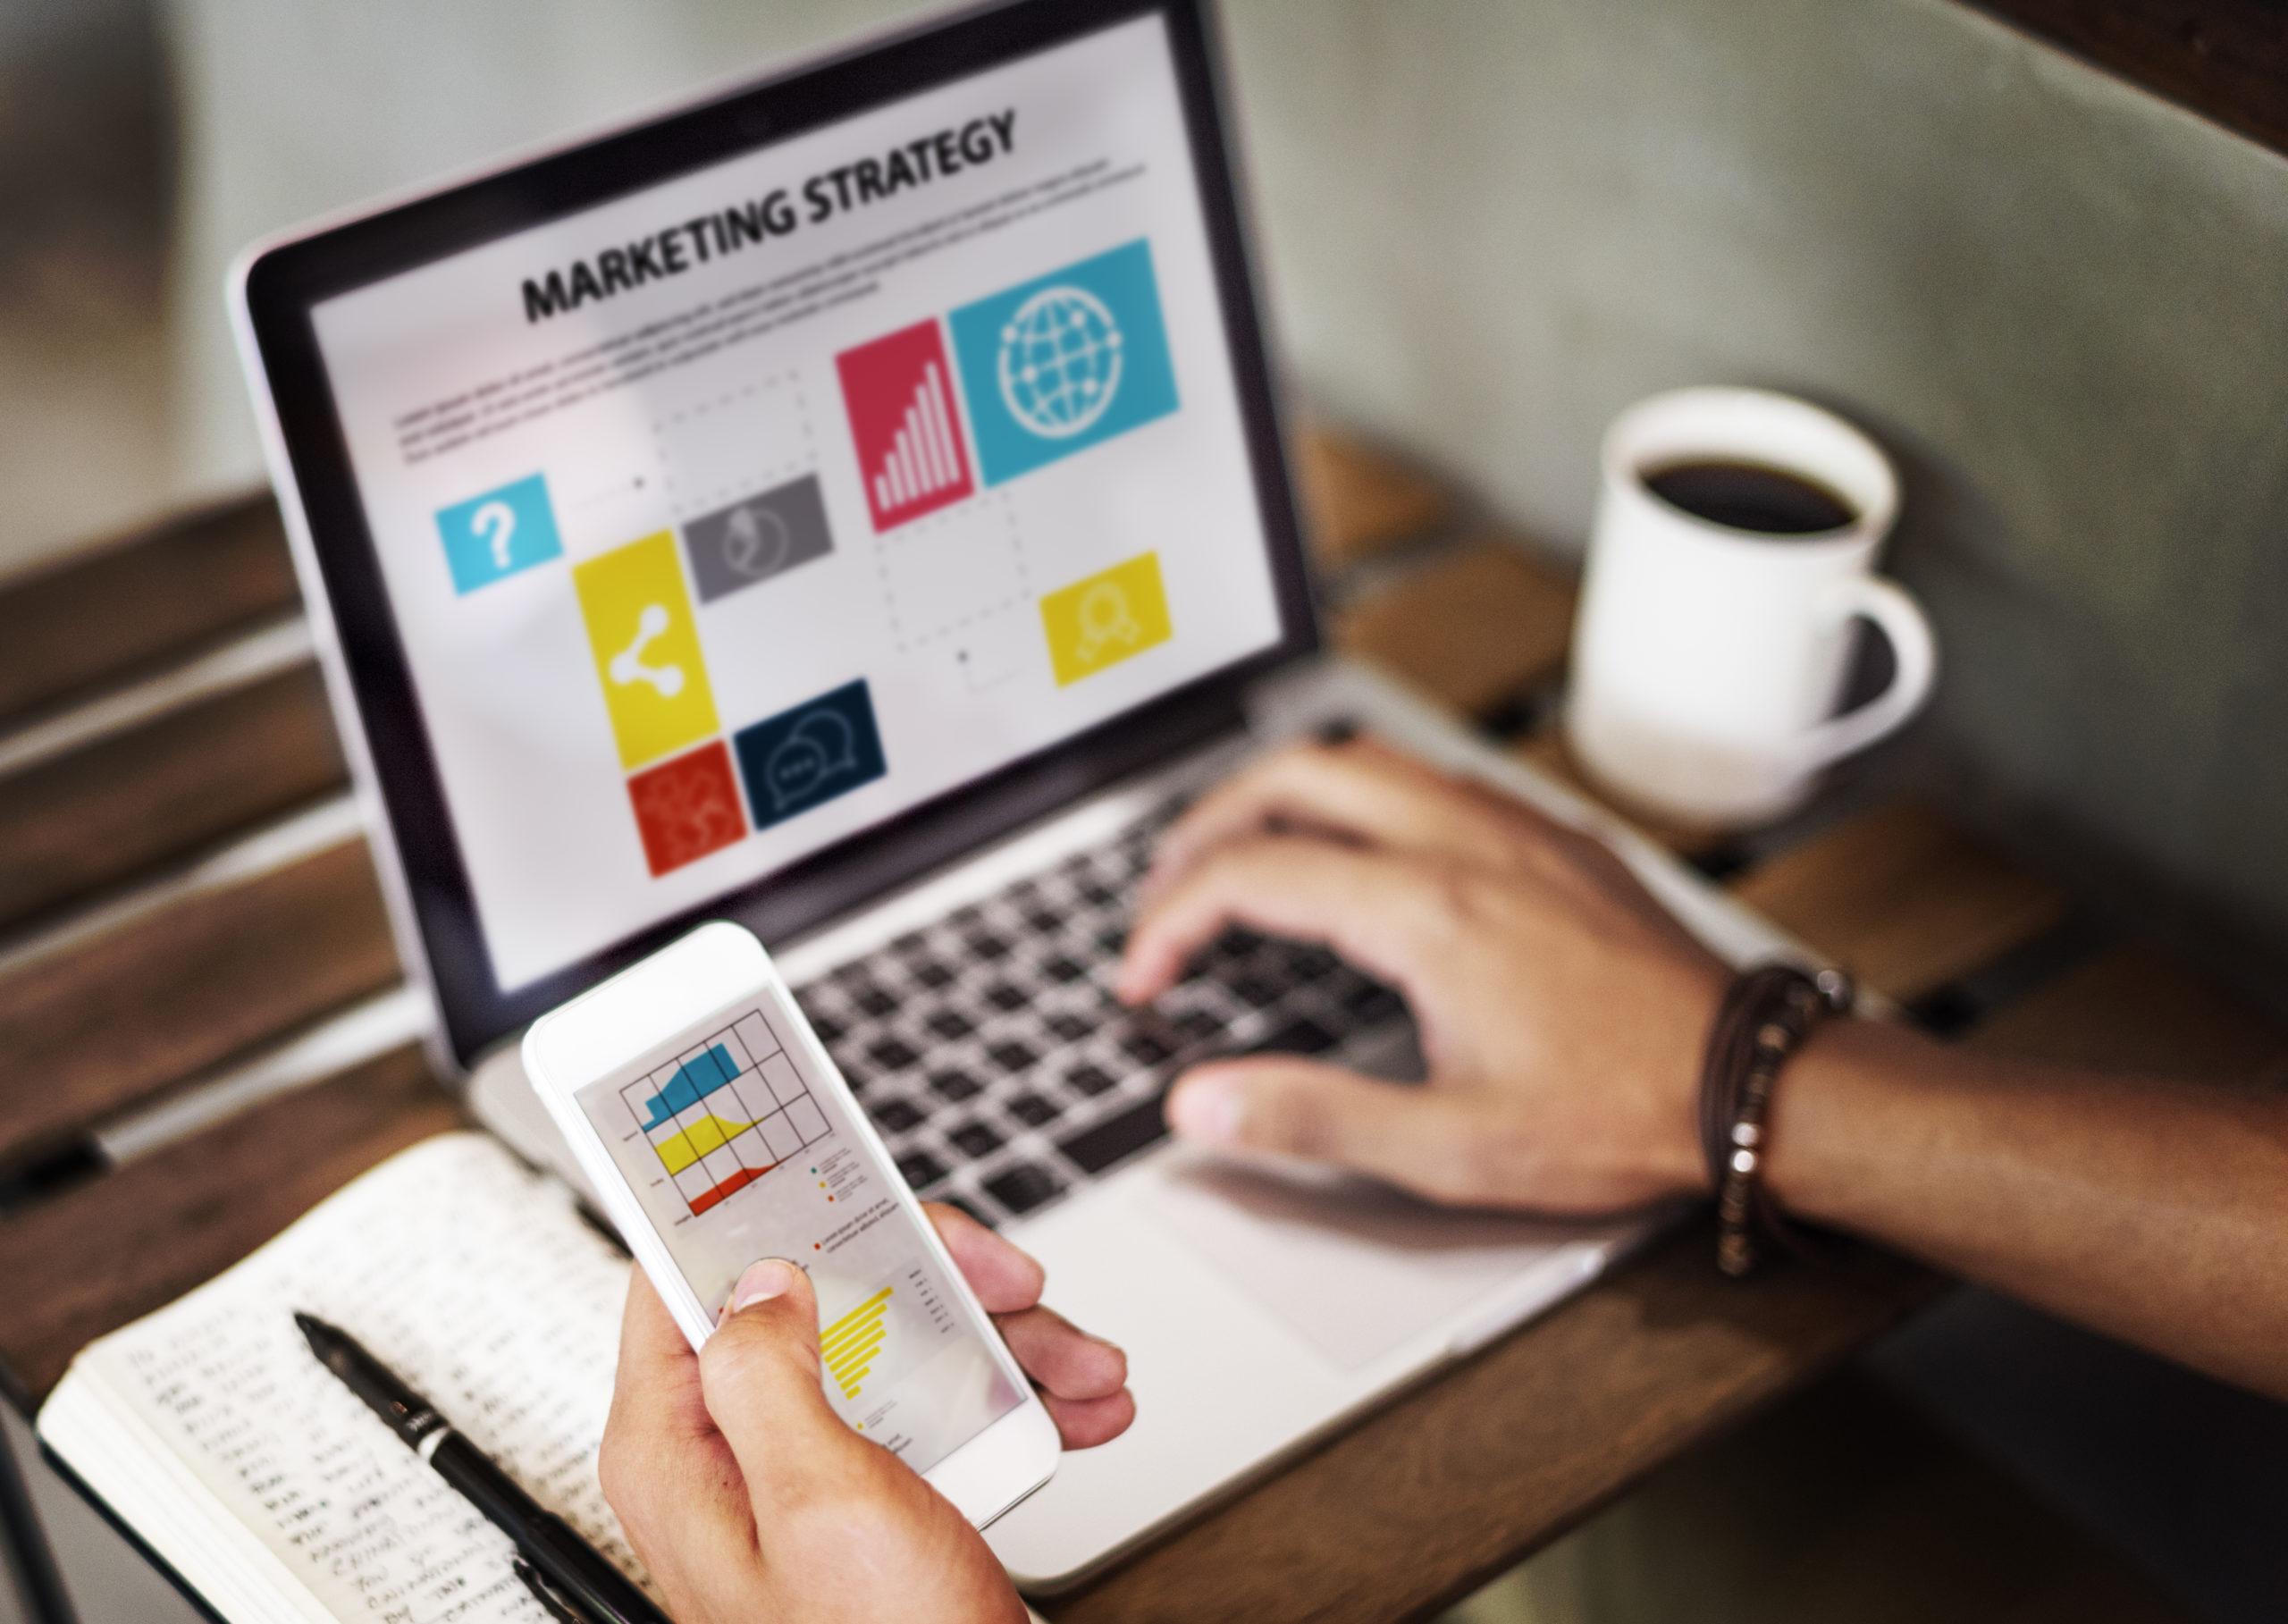 Marketing Estrategia MBA